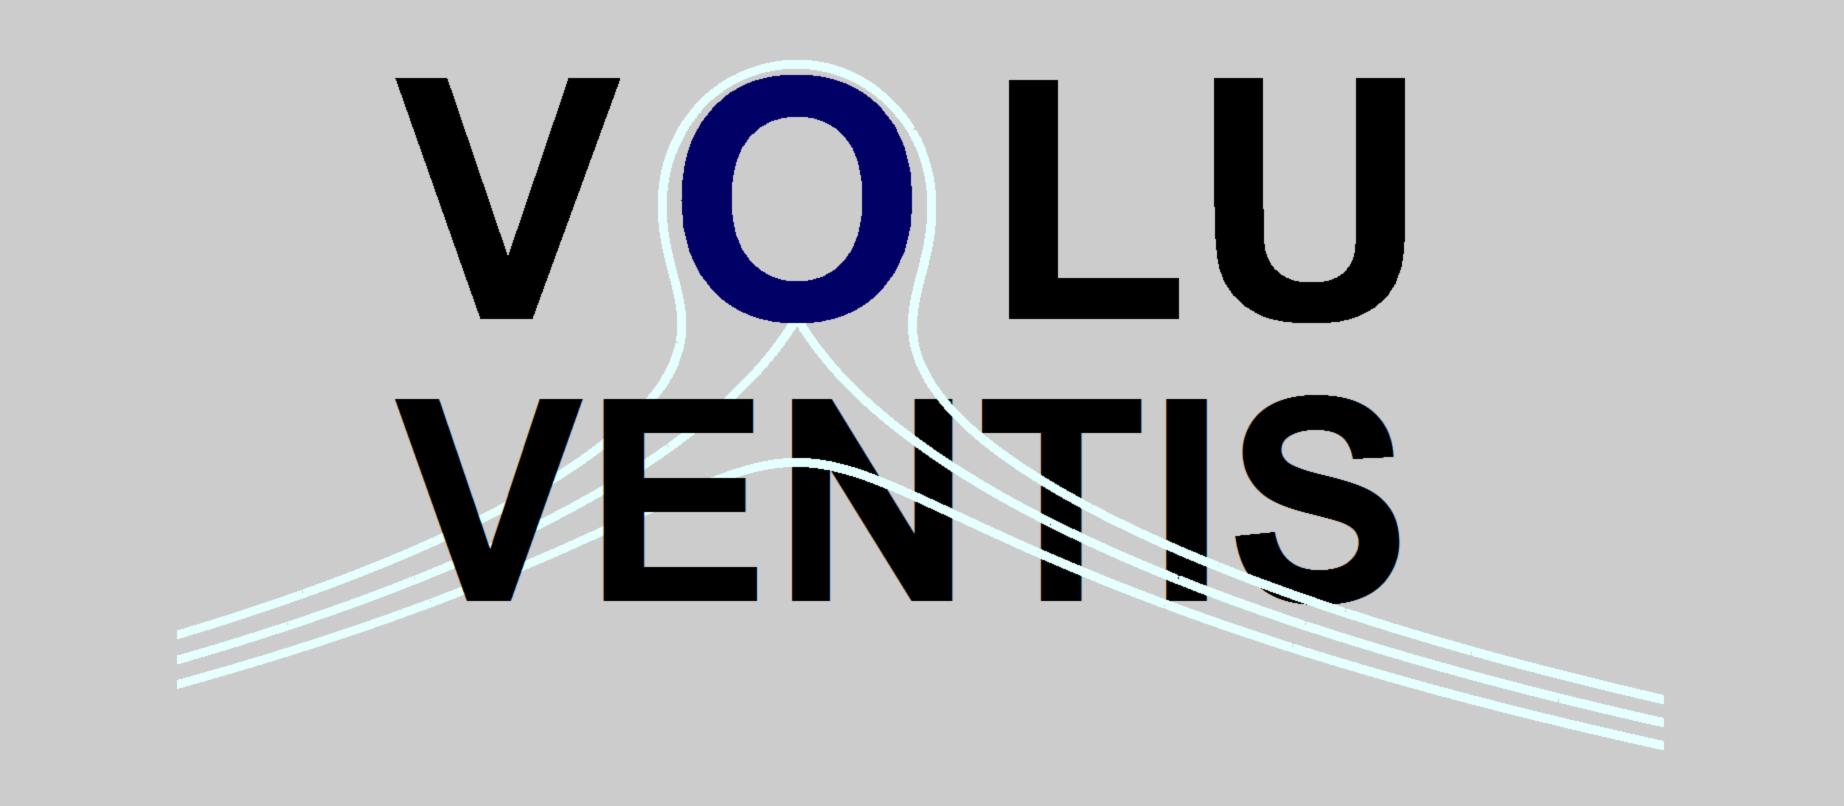 Volu Ventis logo